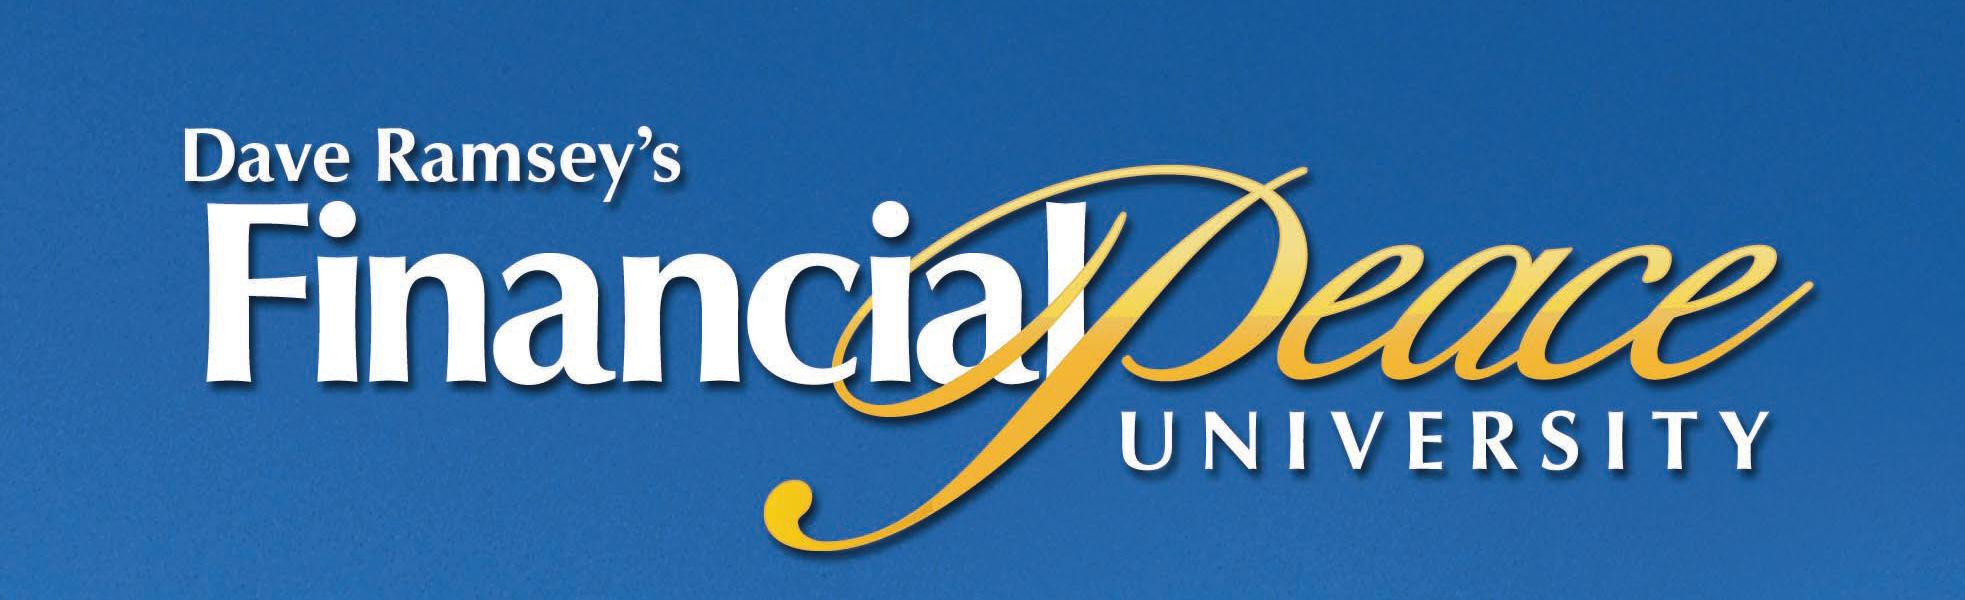 Dave ramseys financial peace university solutioingenieria Images